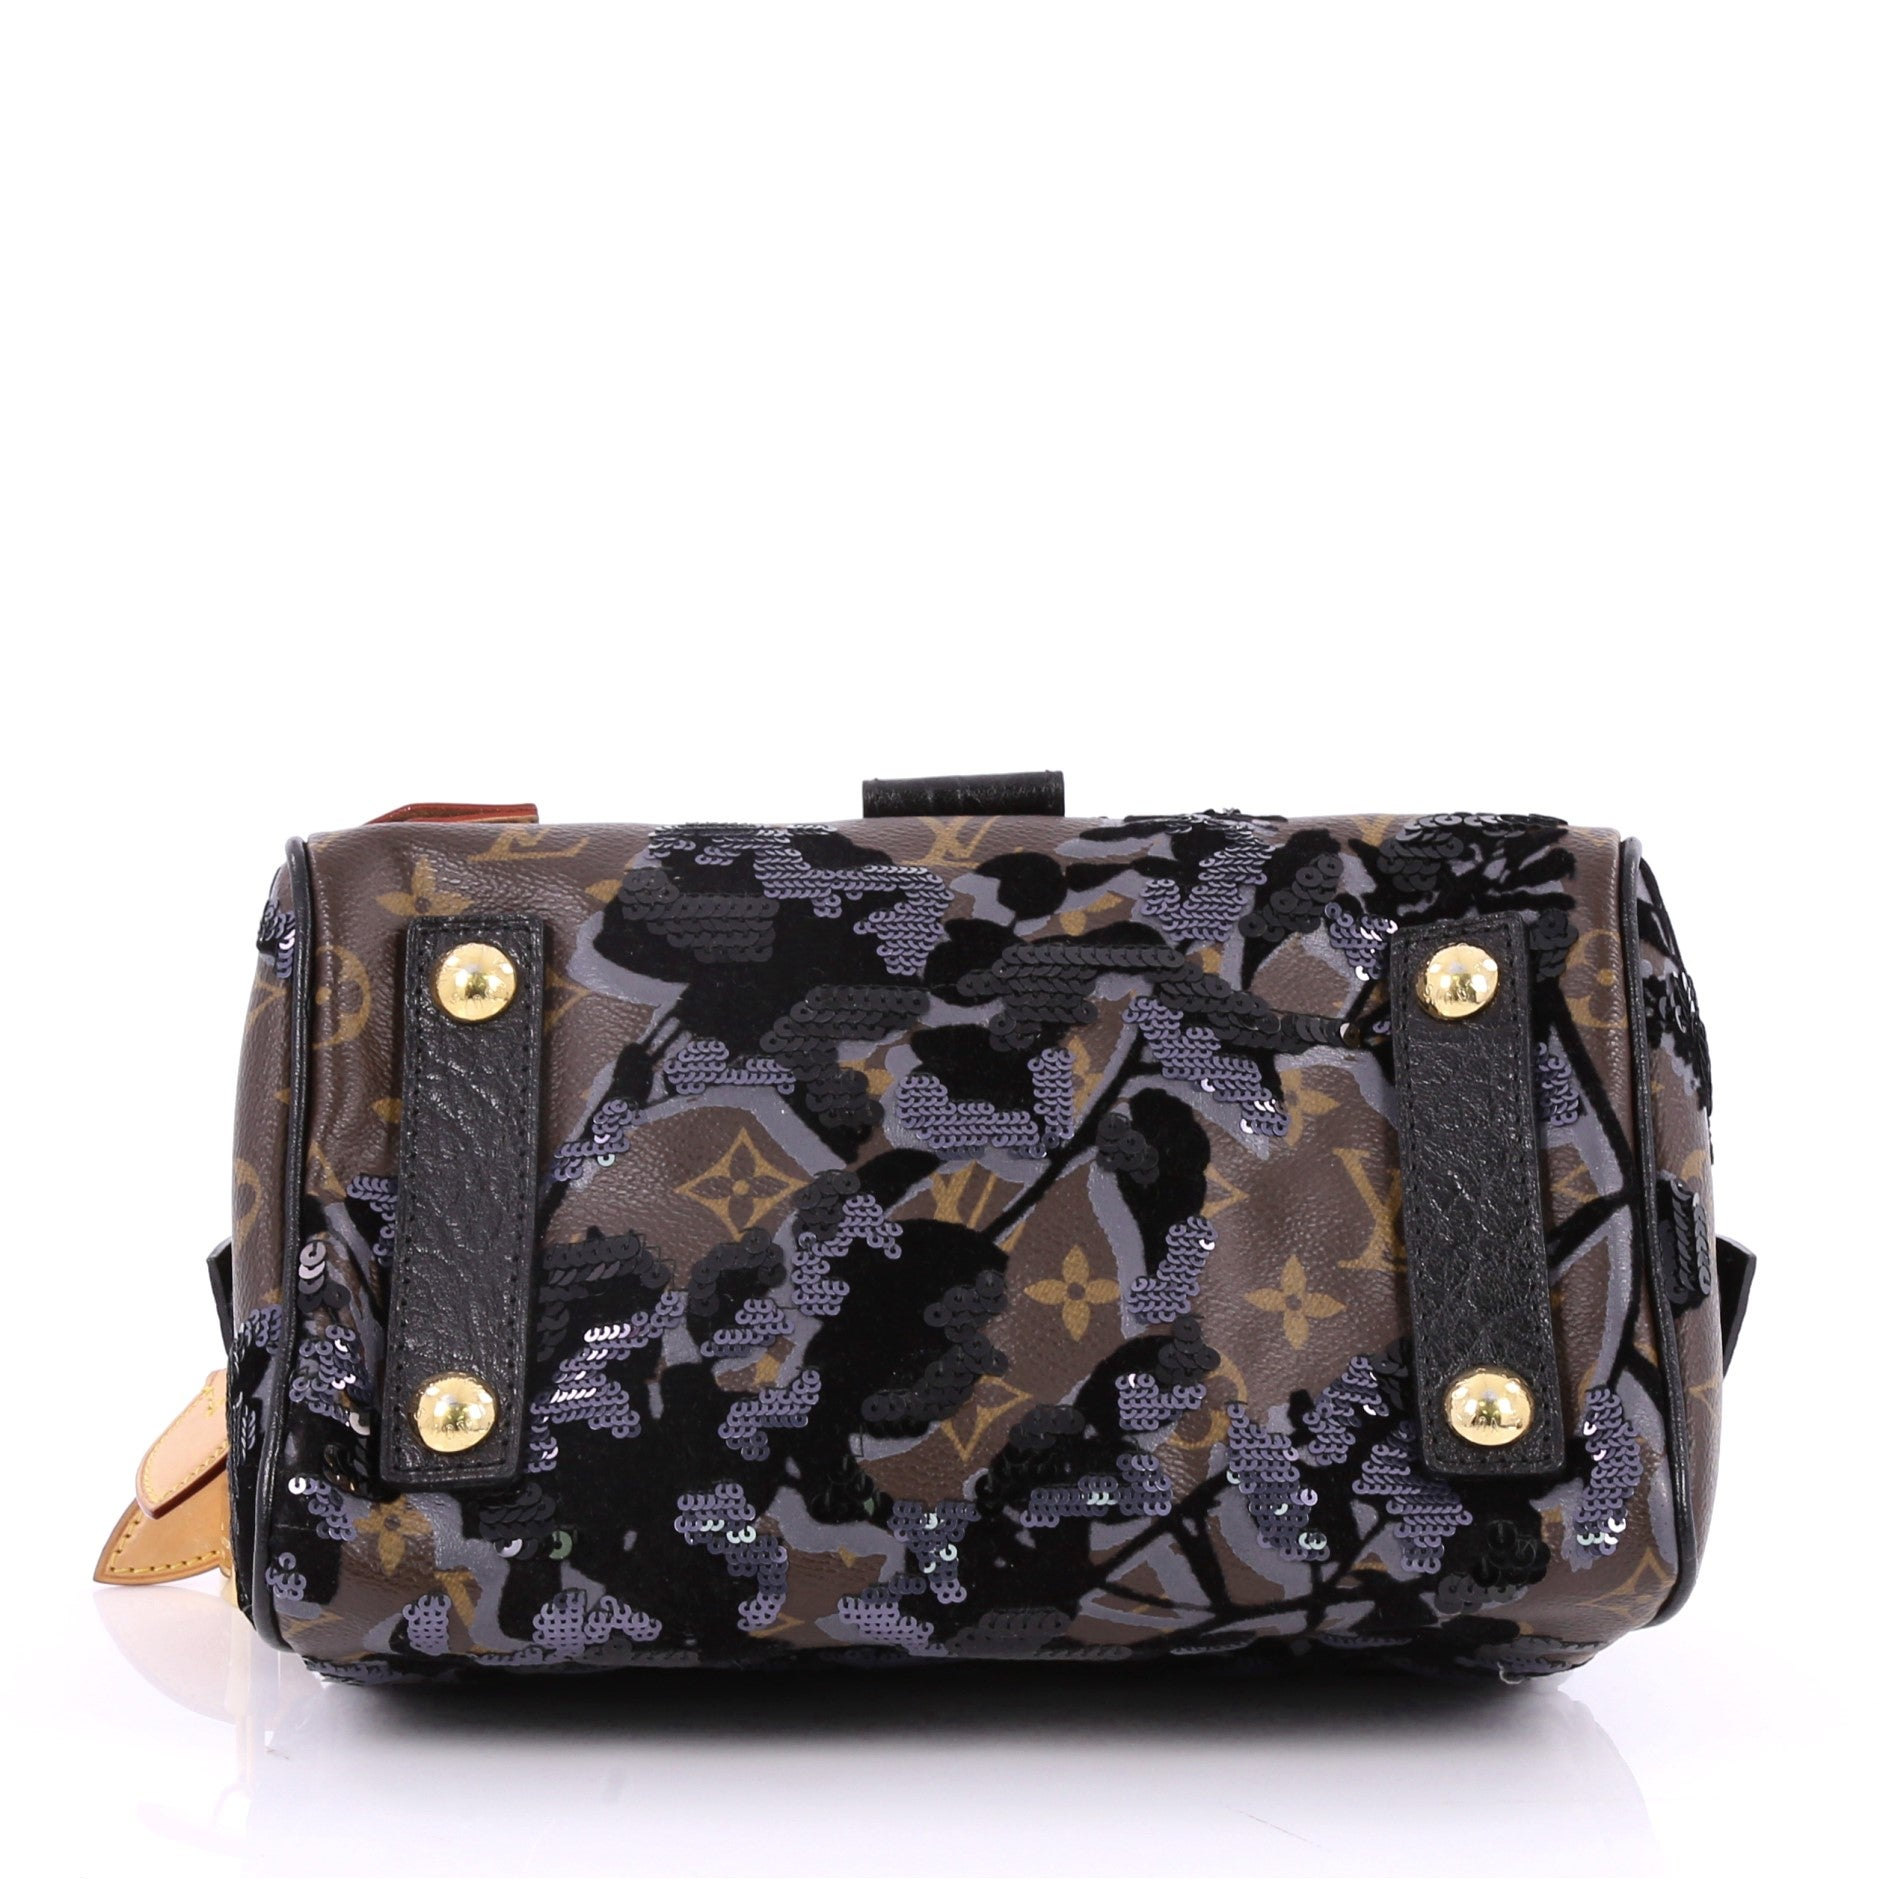 Louis Vuitton Carrousel Handbag Limited Edition Fleur De Jai at 1stdibs 5d62997b25afb